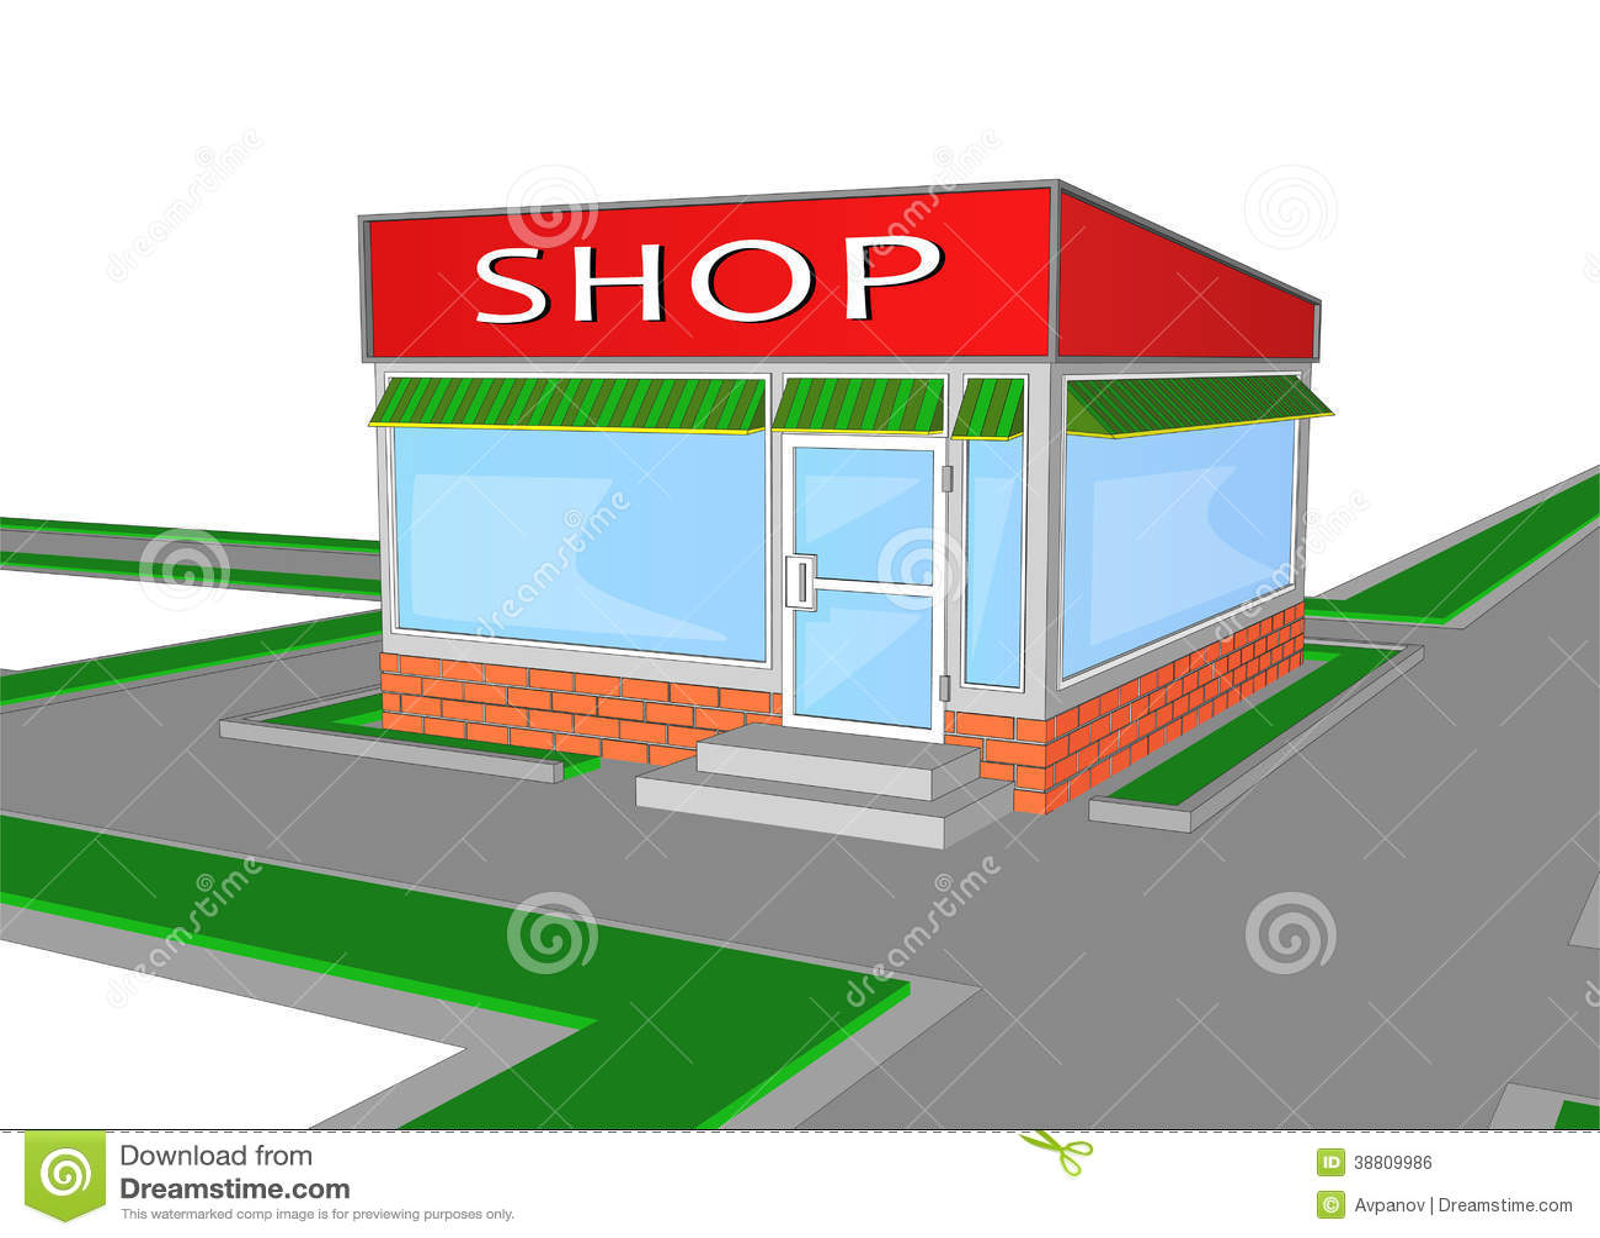 retail store clip art free - photo #40